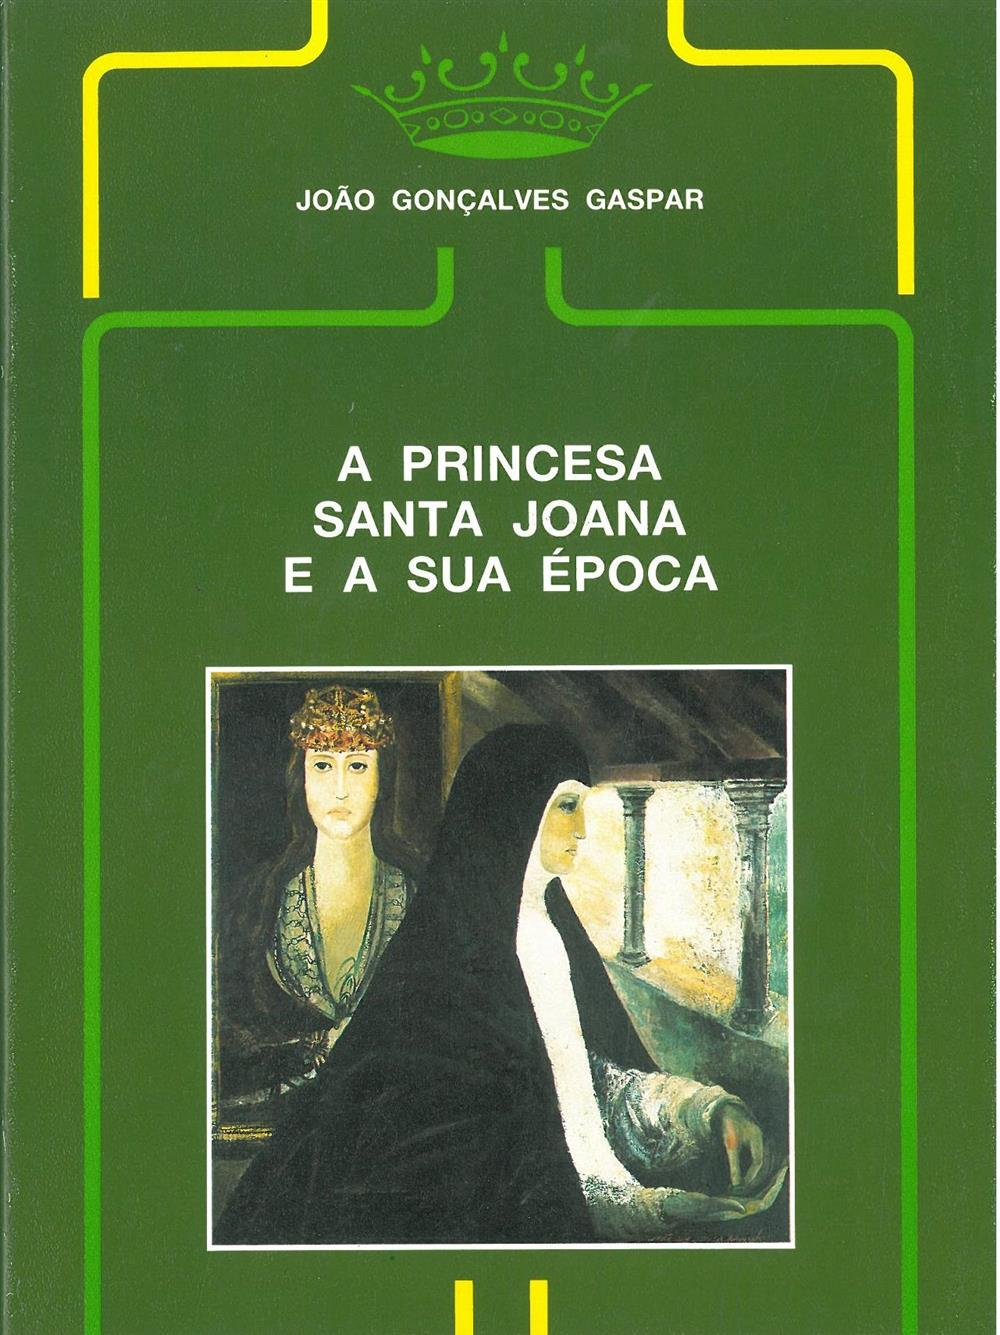 A princesa Santa Joana e a sua época_.jpg